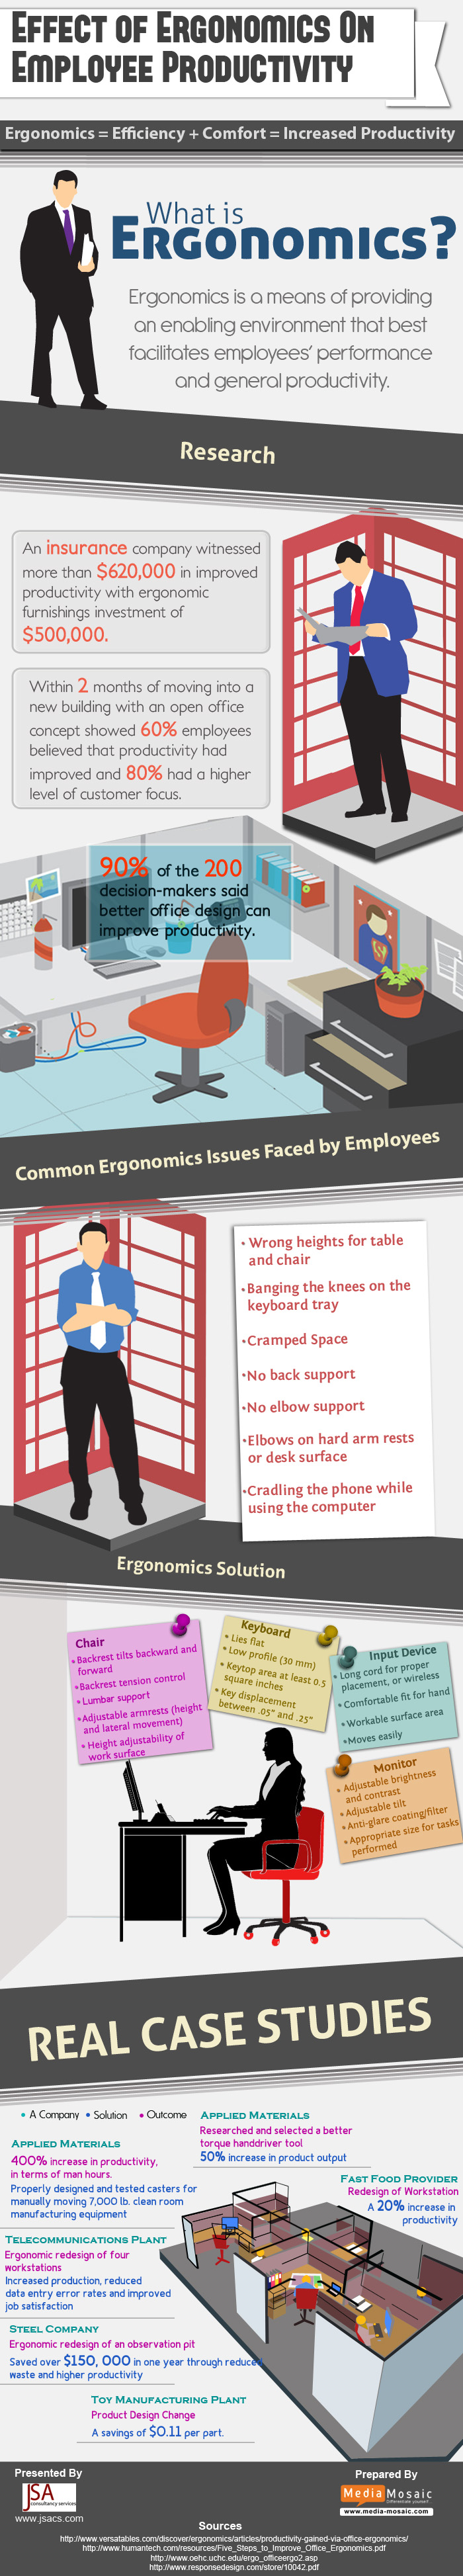 effect-of-ergonomics-on-employee-productivity-infographic_525e3c909c0e4